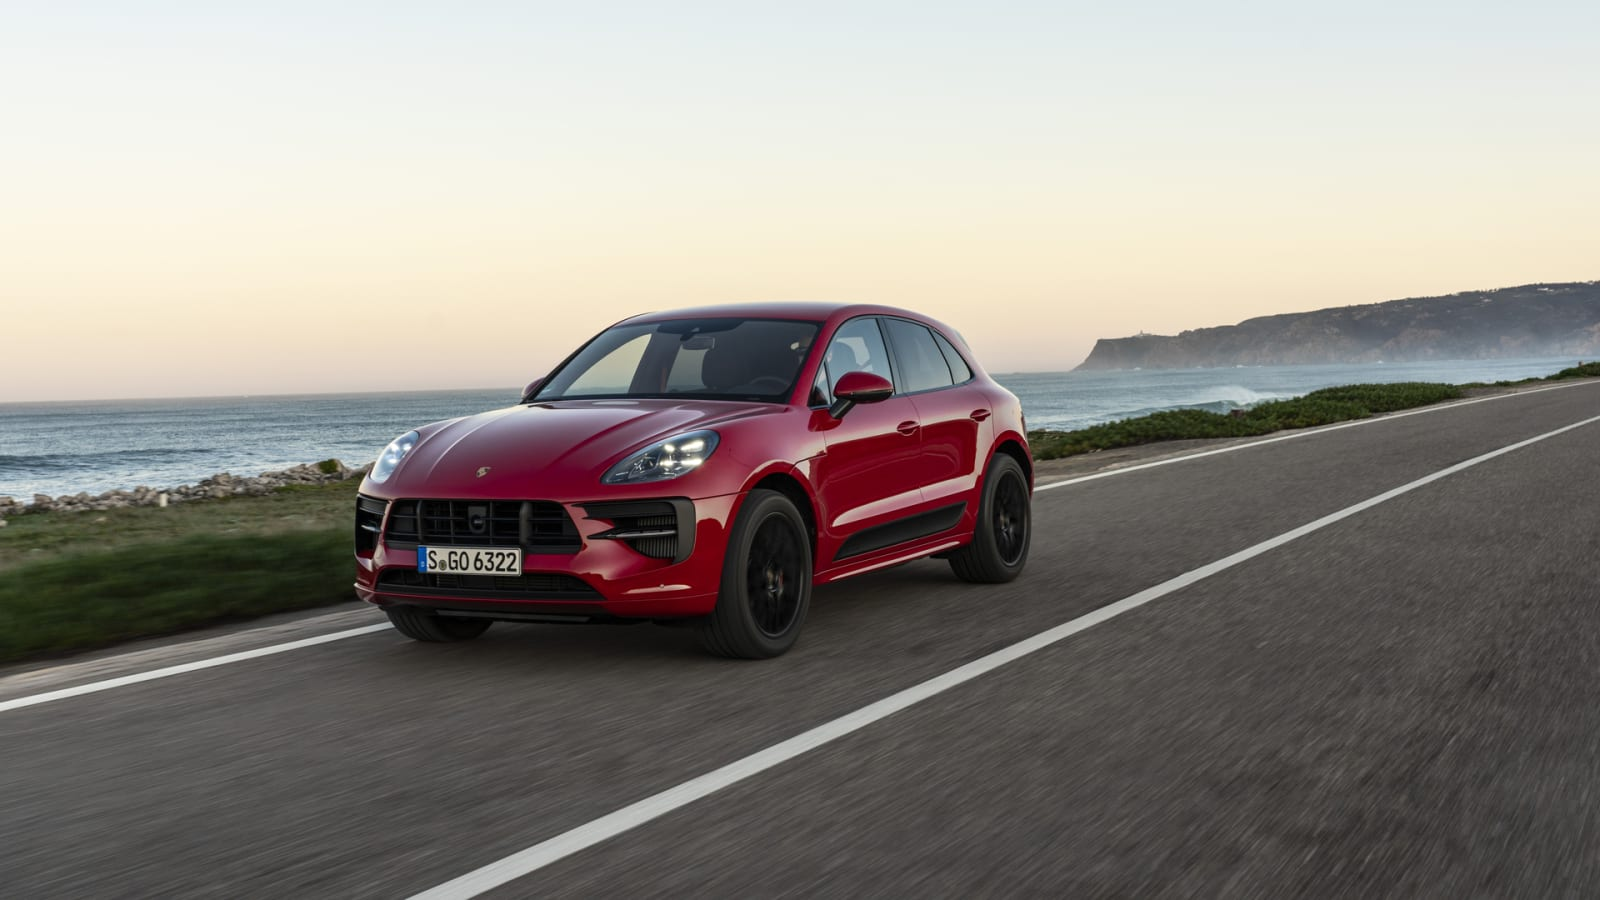 2020 Porsche Macan Gts First Drive What S New Horsepower Handling Driving Impressions Autoblog